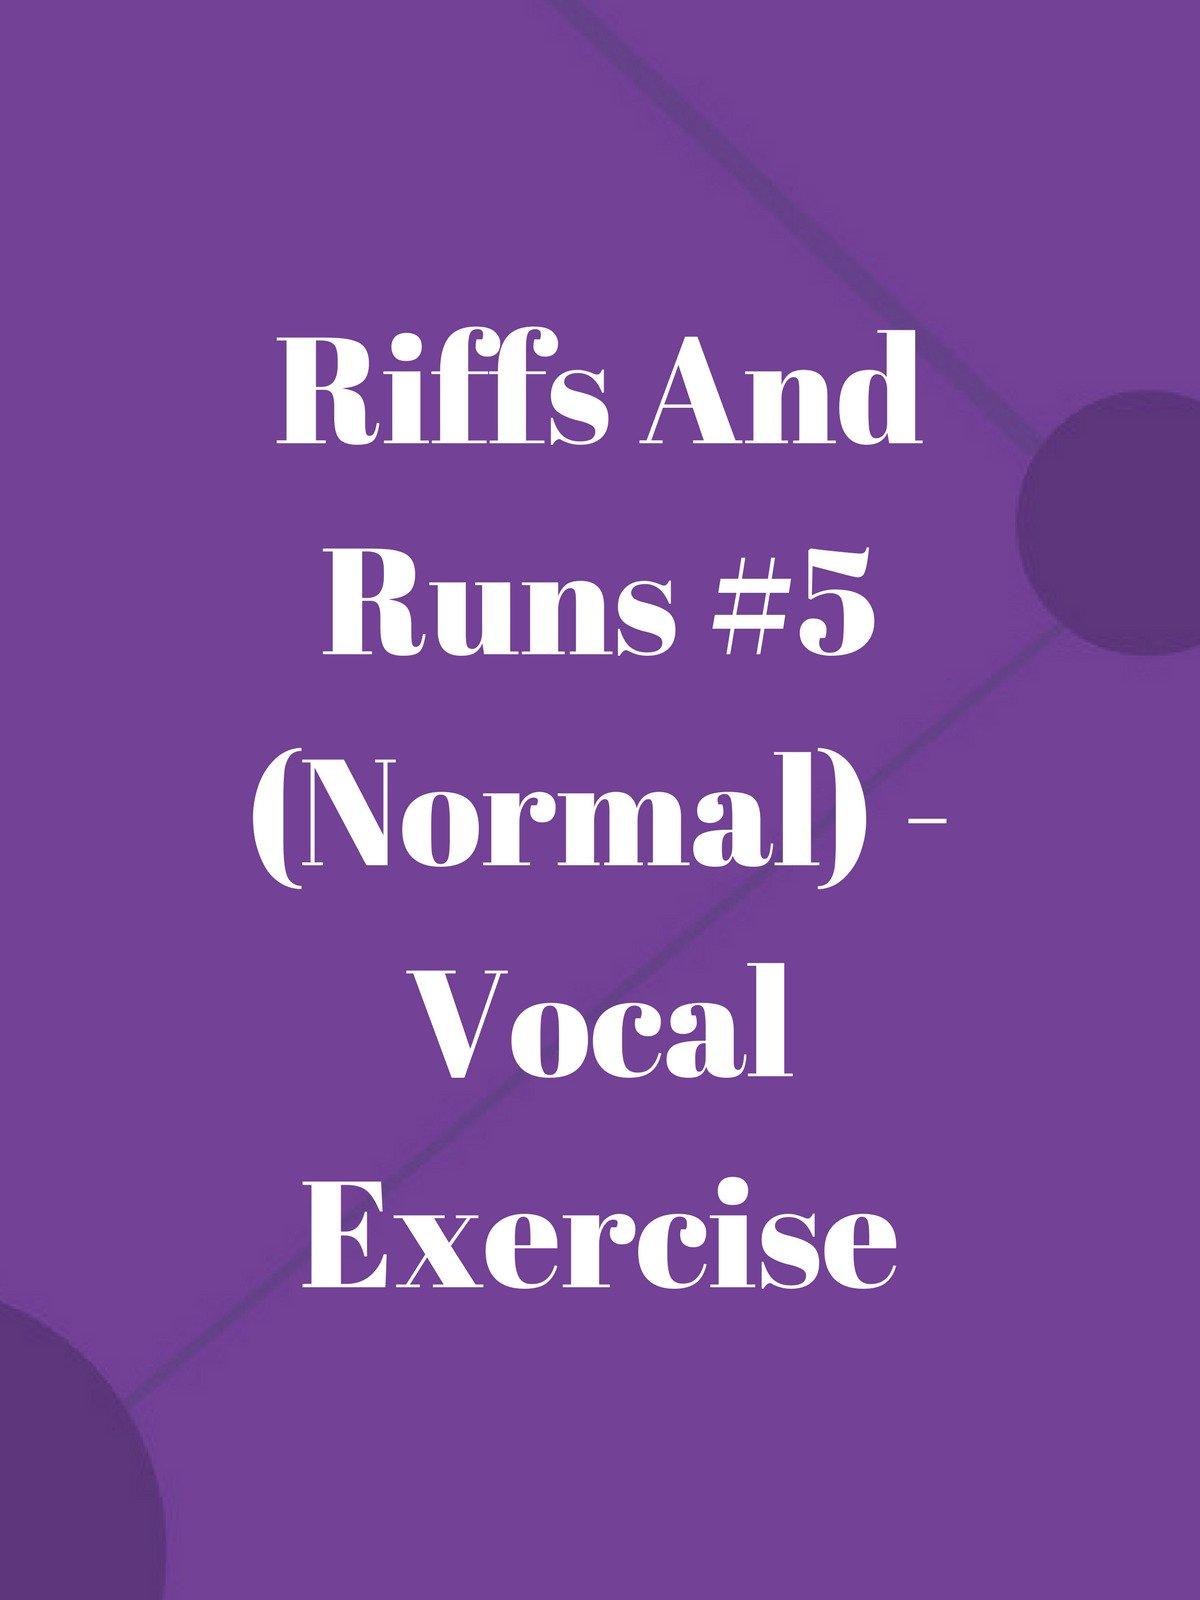 Riffs And Runs #5 (Normal)